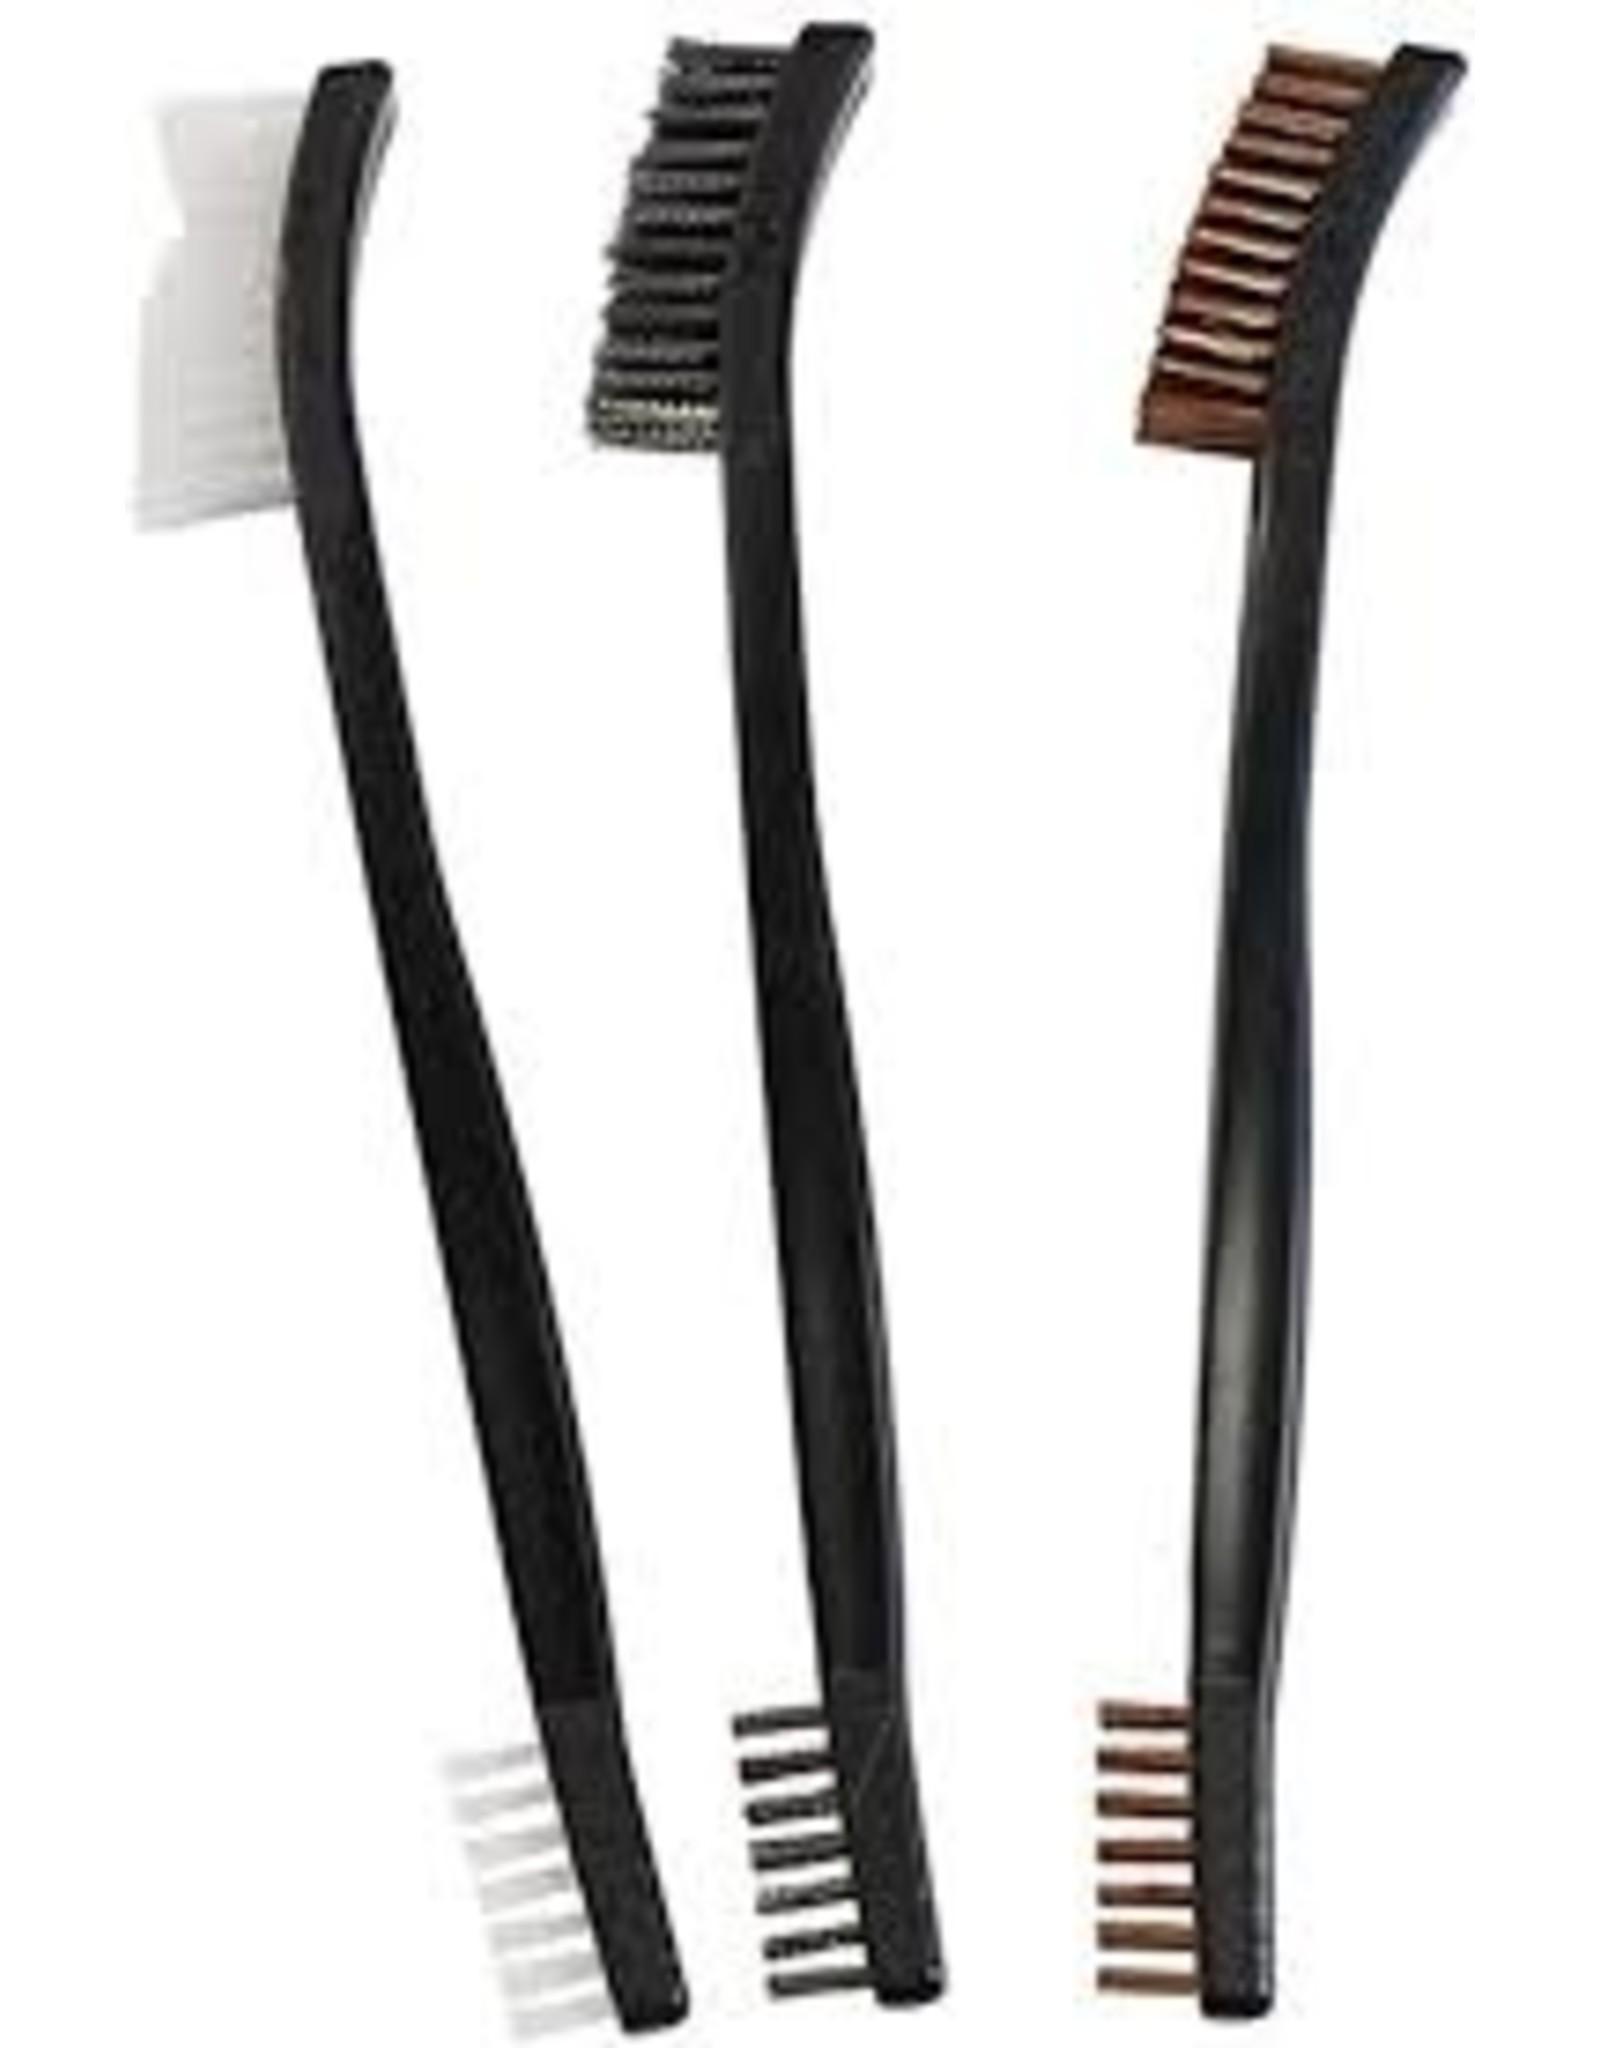 Birchwood casey Birchewood Casey Utility Brushes Bronze, Nylon, Stainless Steel